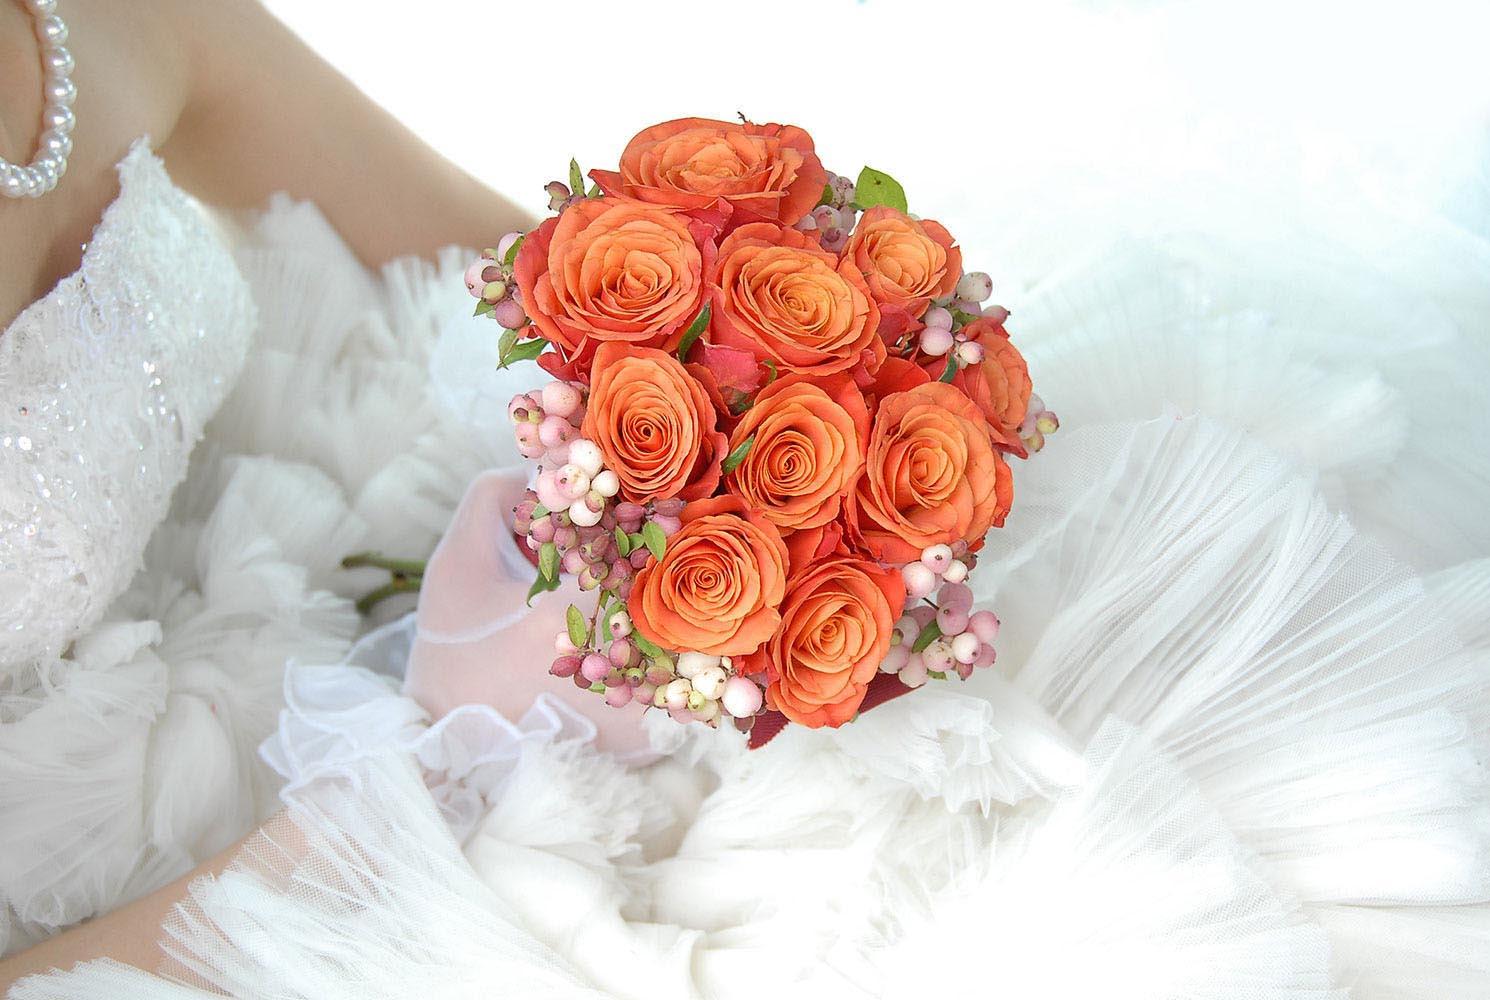 Bouquet de mariage orange tenue par la mariee sur sa robe